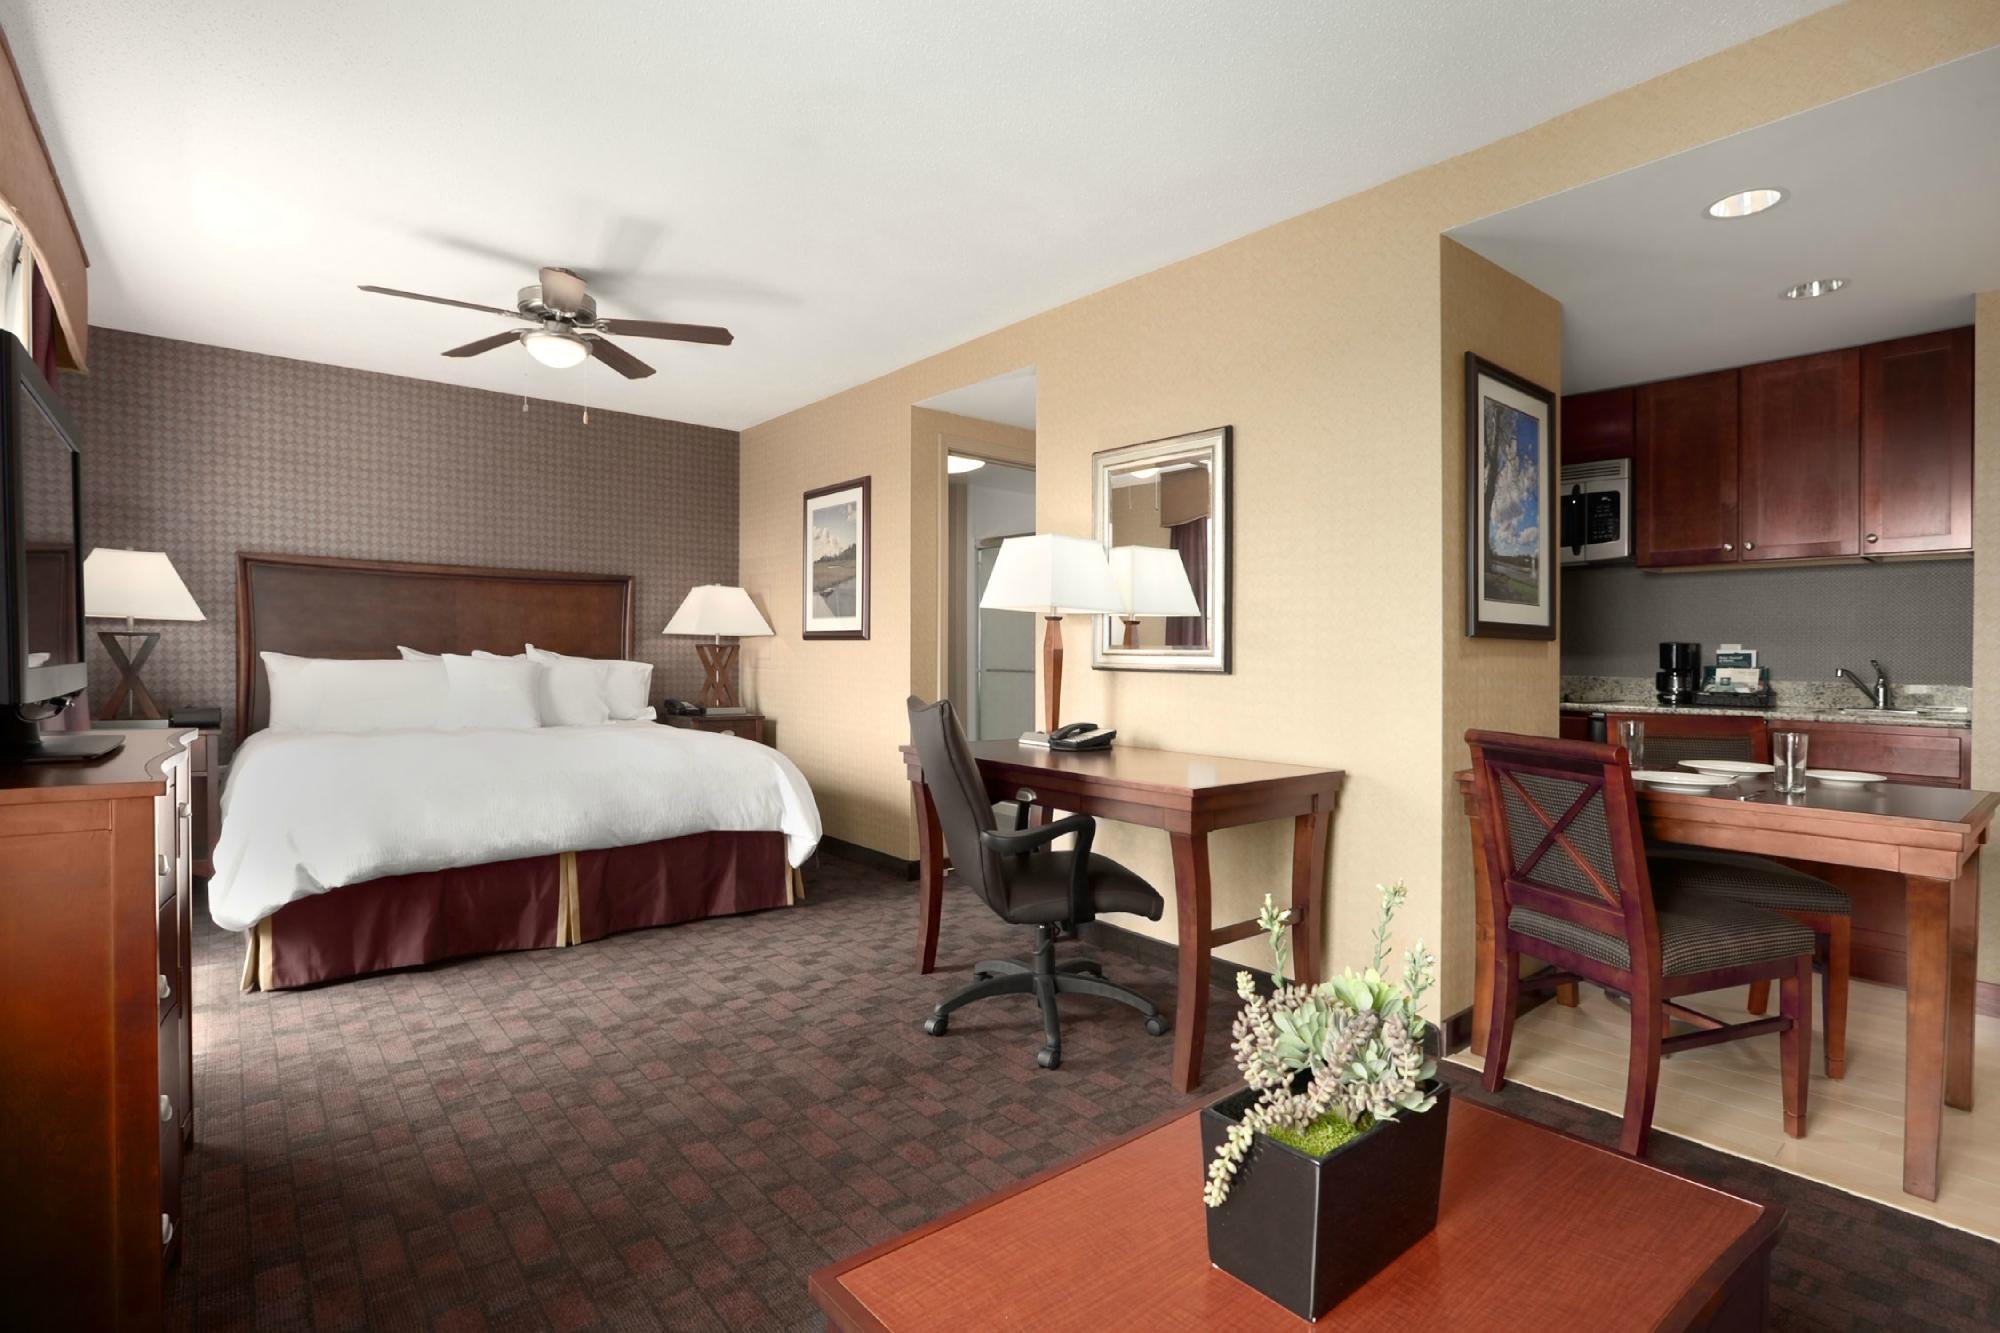 Homewood Suites By Hilton Atlantic City Egg Harbor